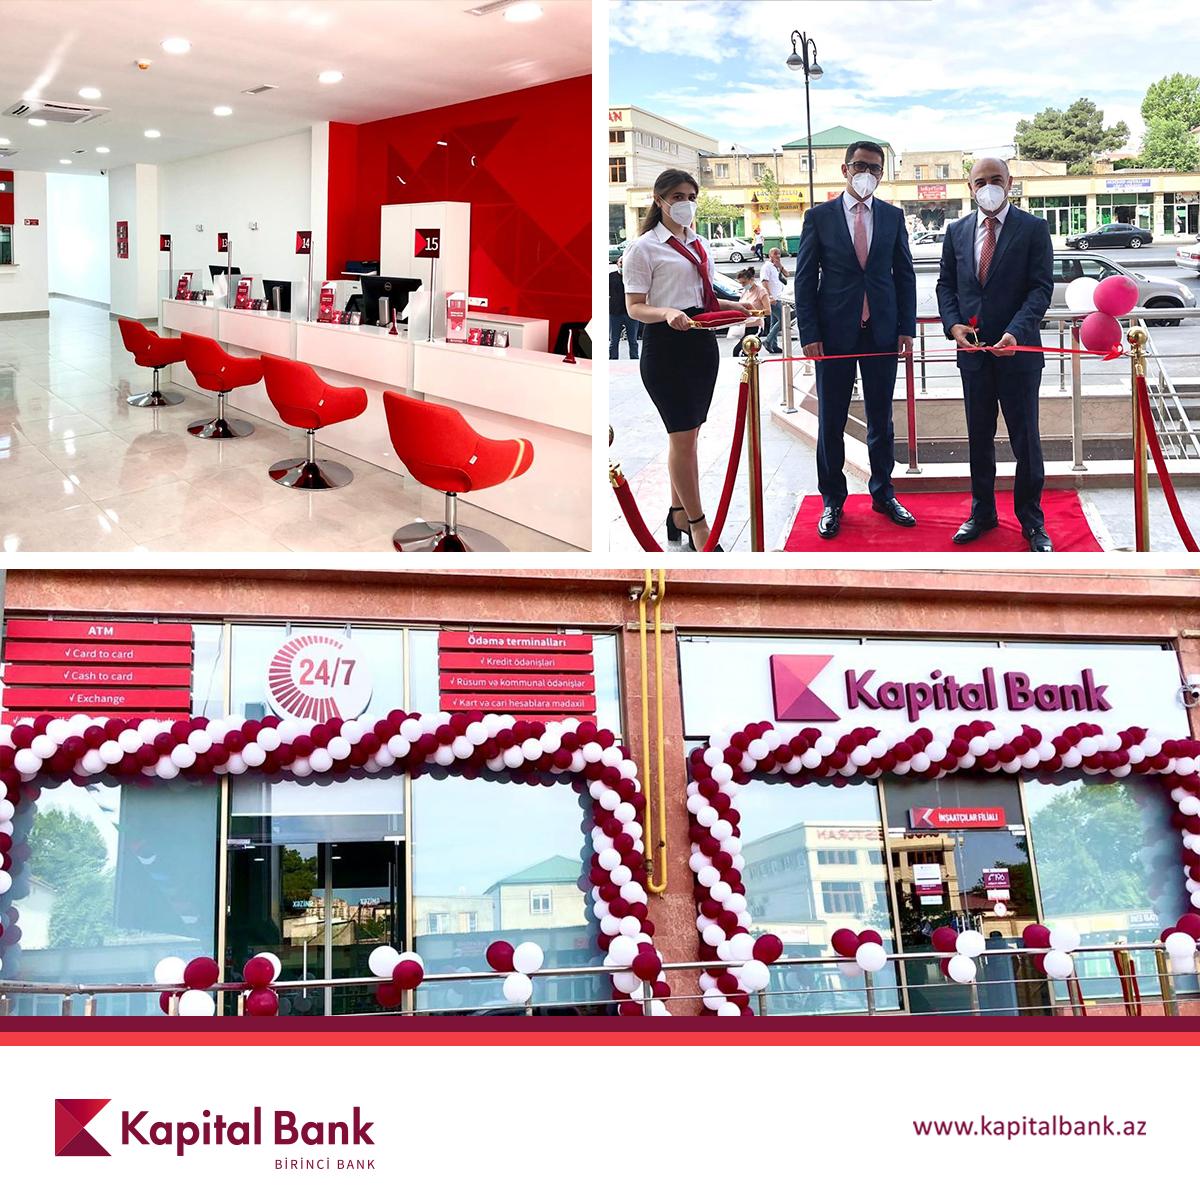 Kapital Bank представил новый филиал «Иншаатчылар»